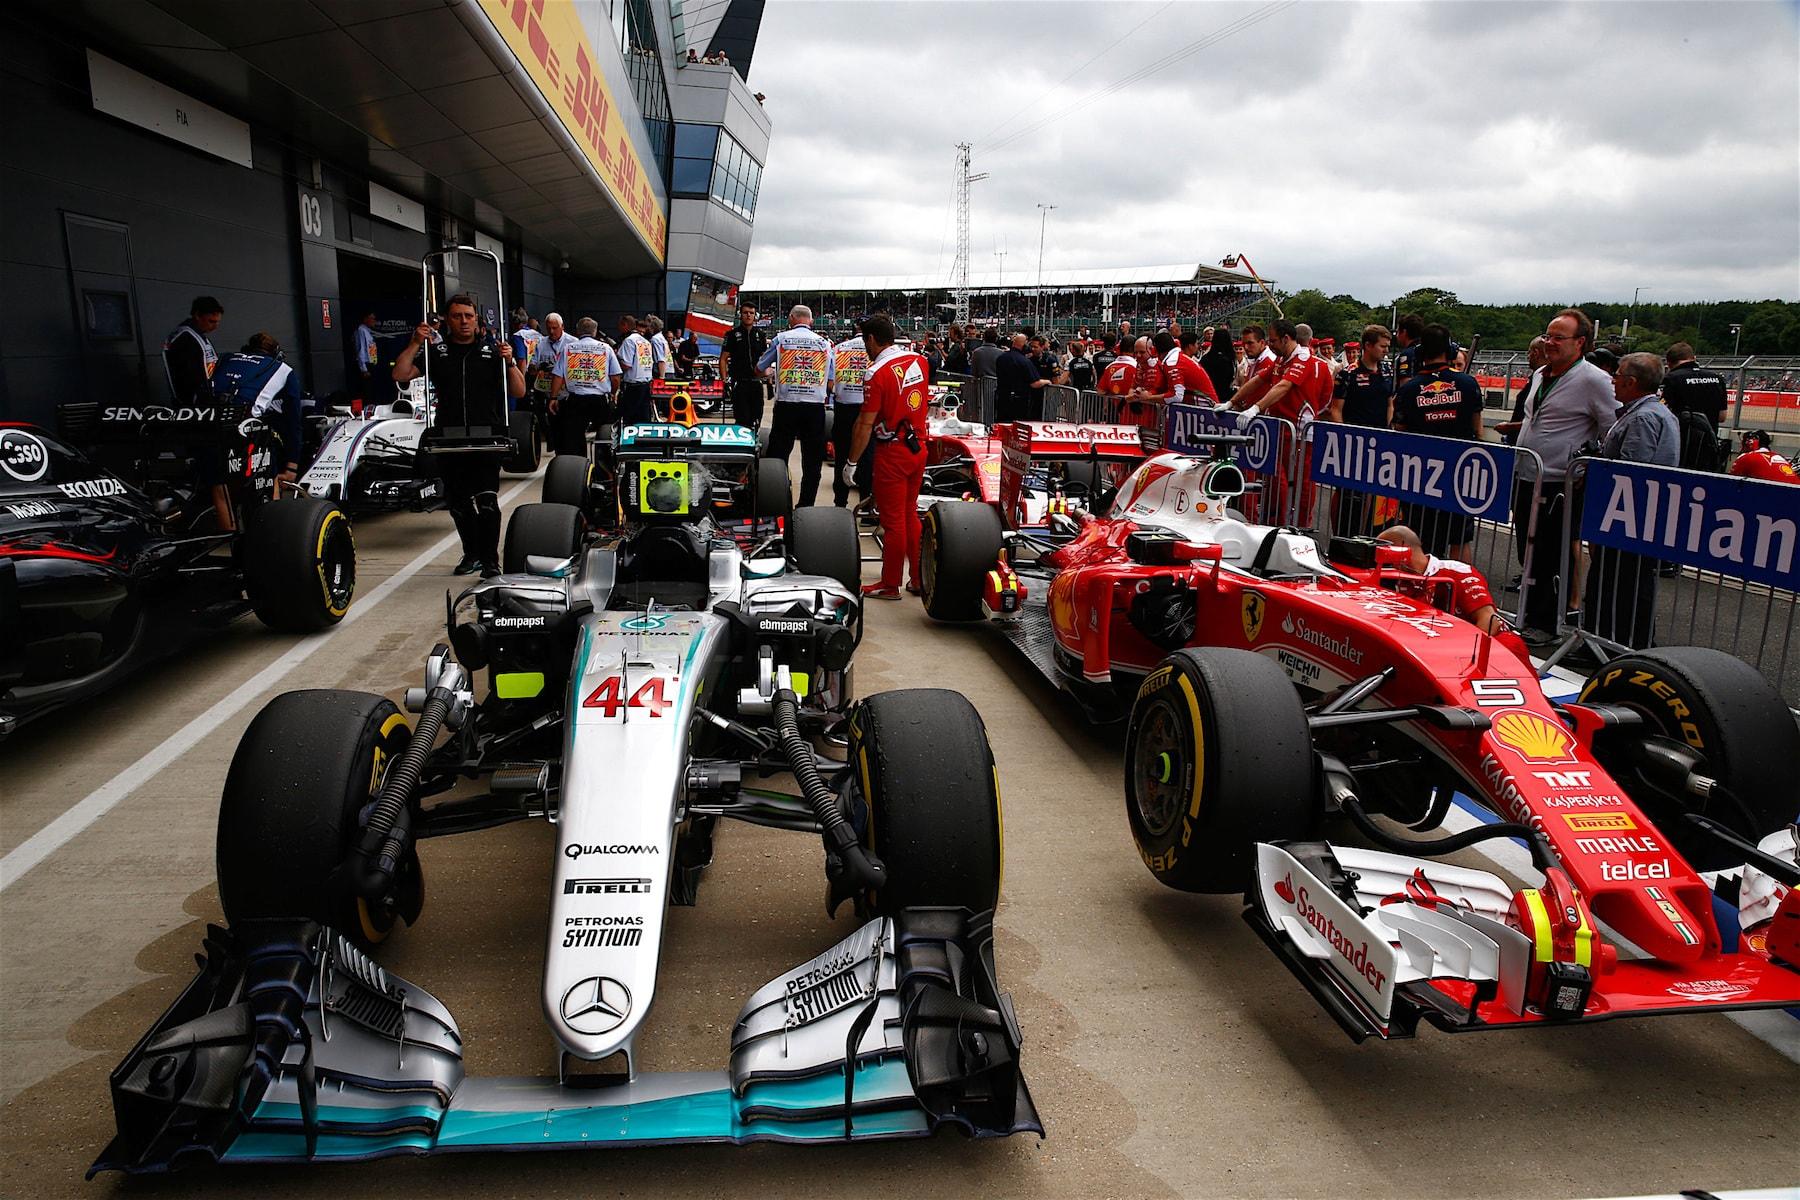 Salracing | British Grand Prix cars after the race